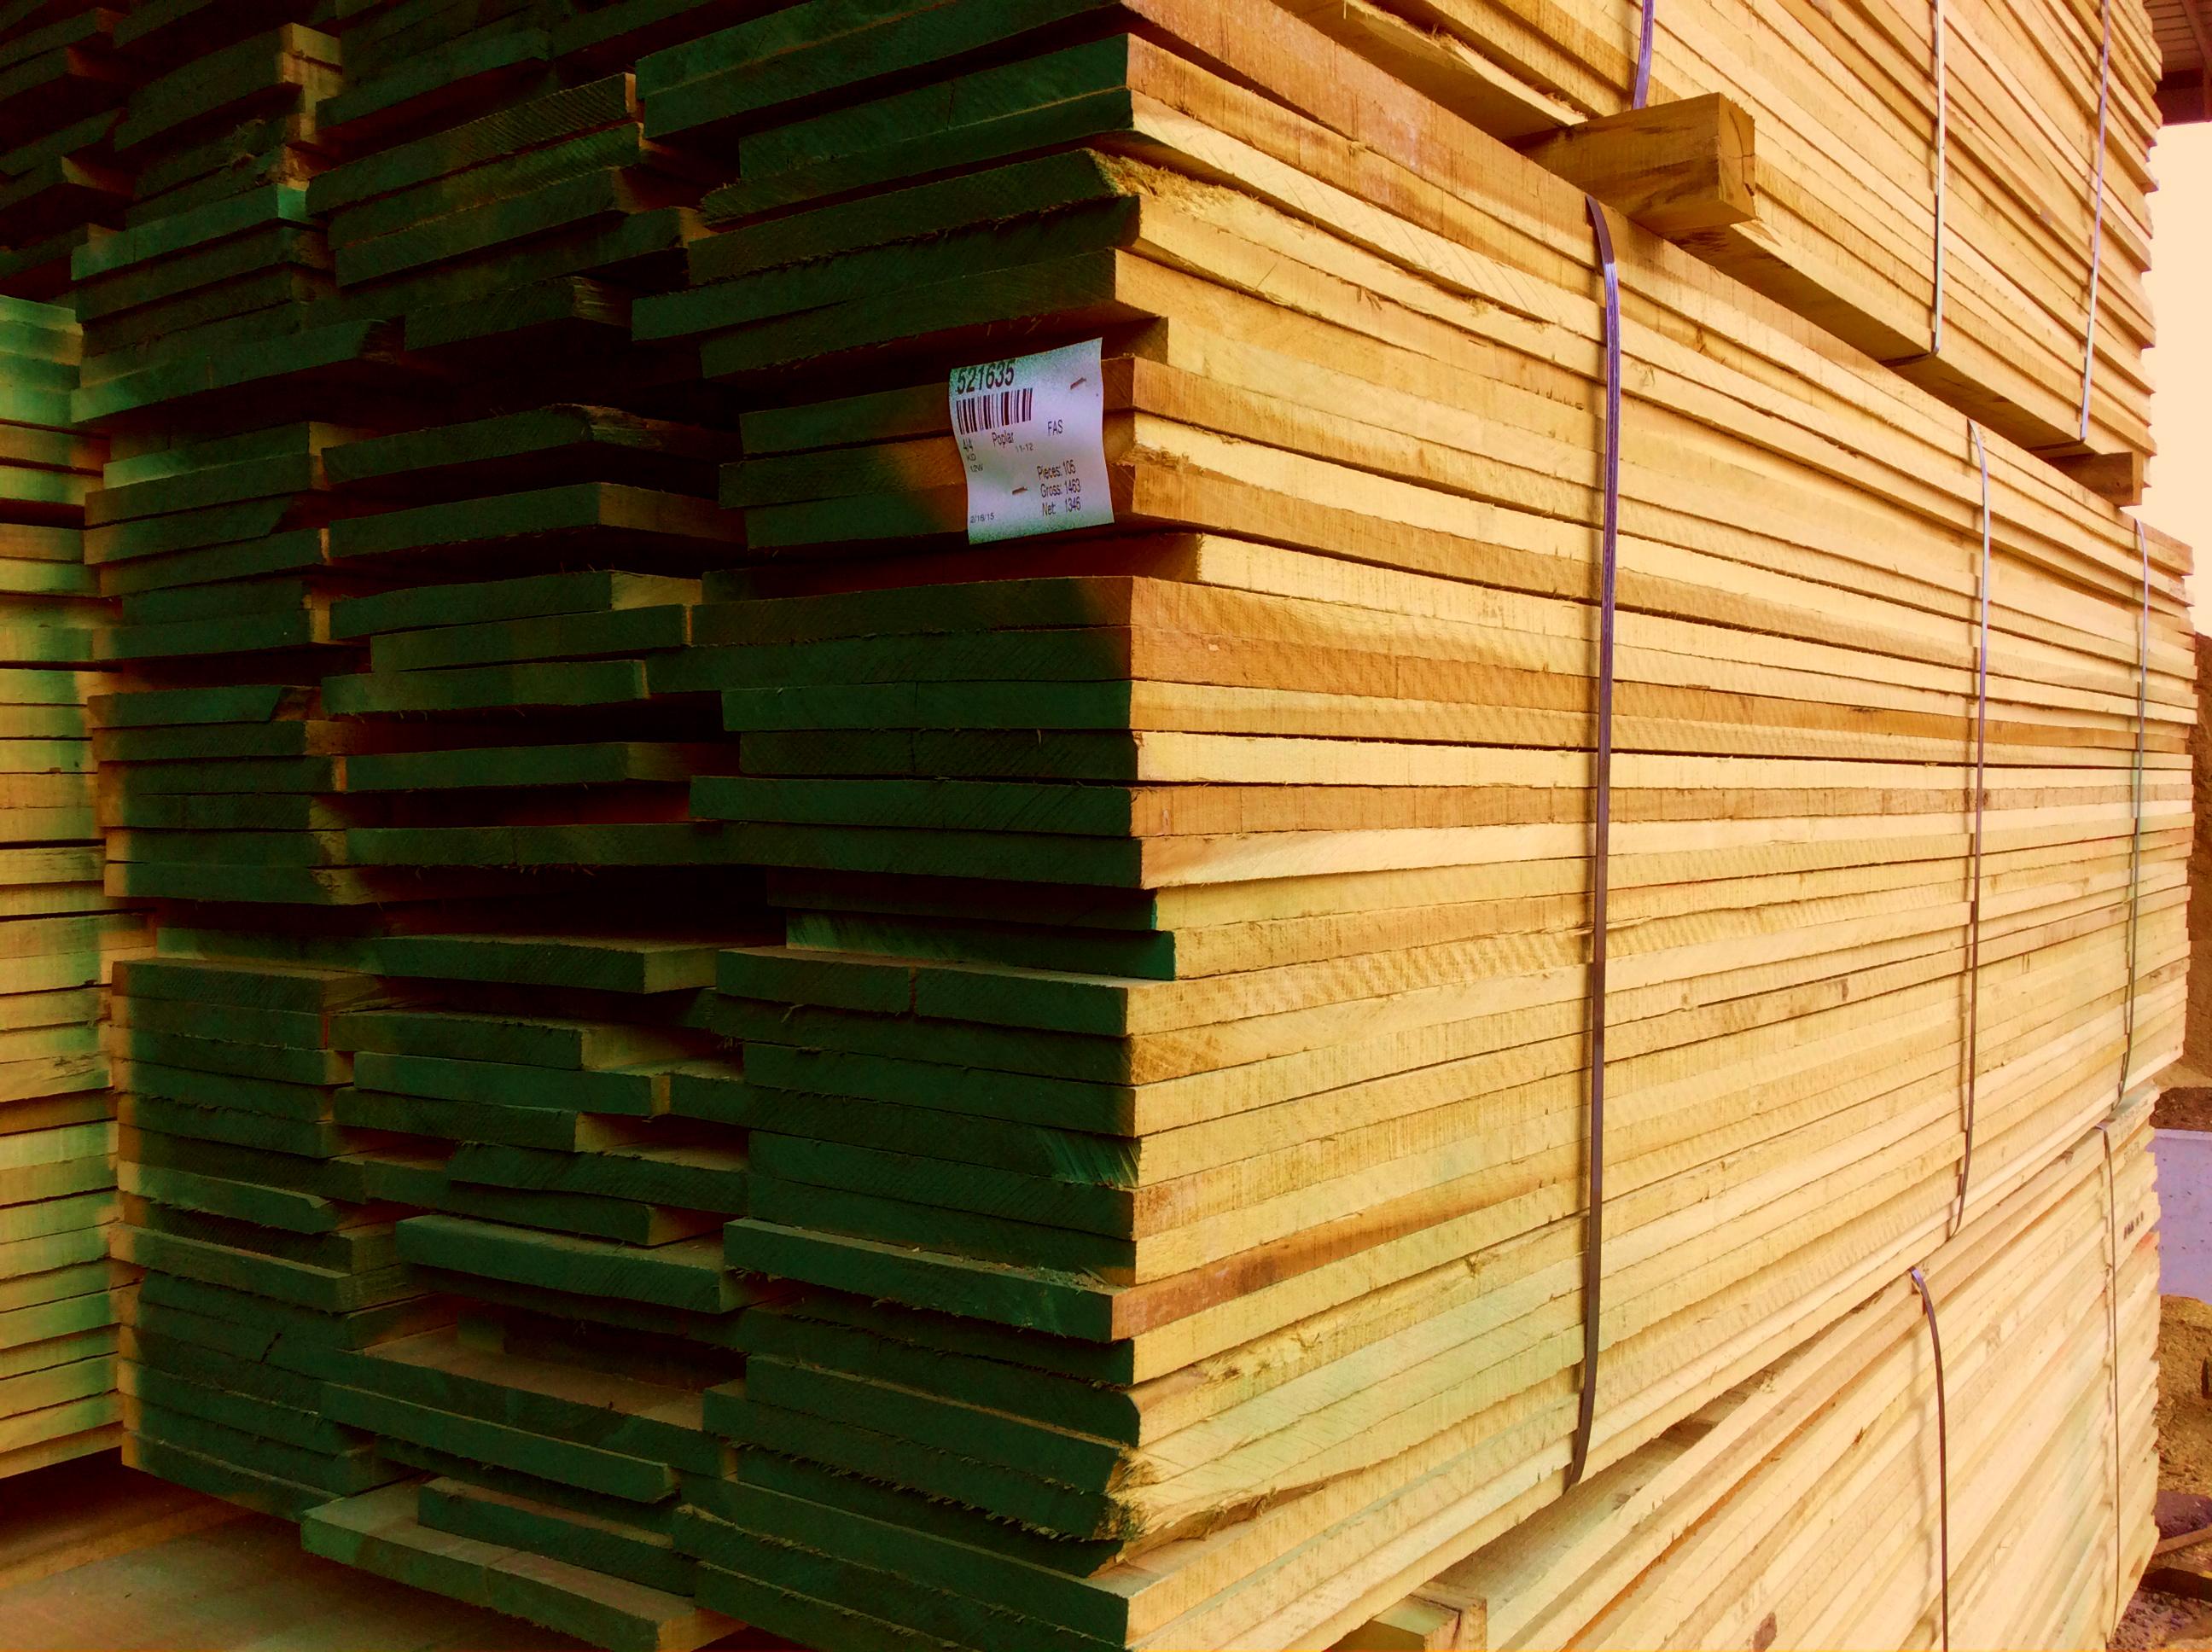 turman lumber packs with green 2